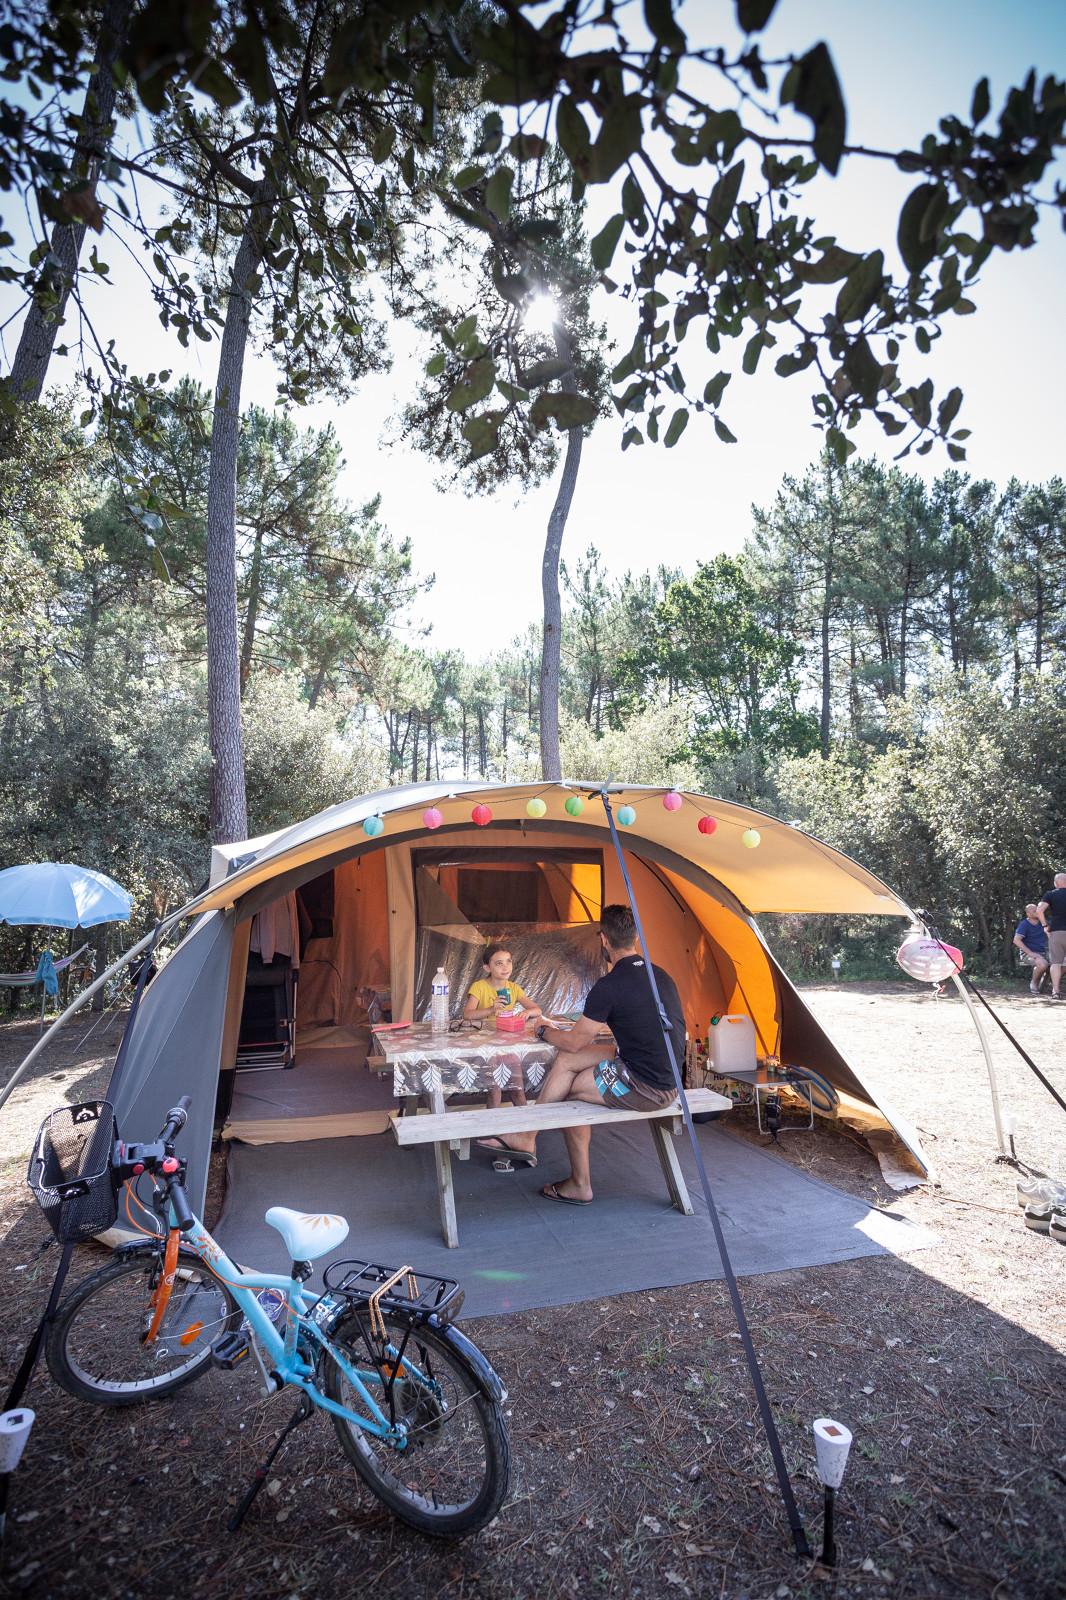 Camping Huttopia Oléron les Pins, Saint-Trojan-les-Bains, Charente-Maritime